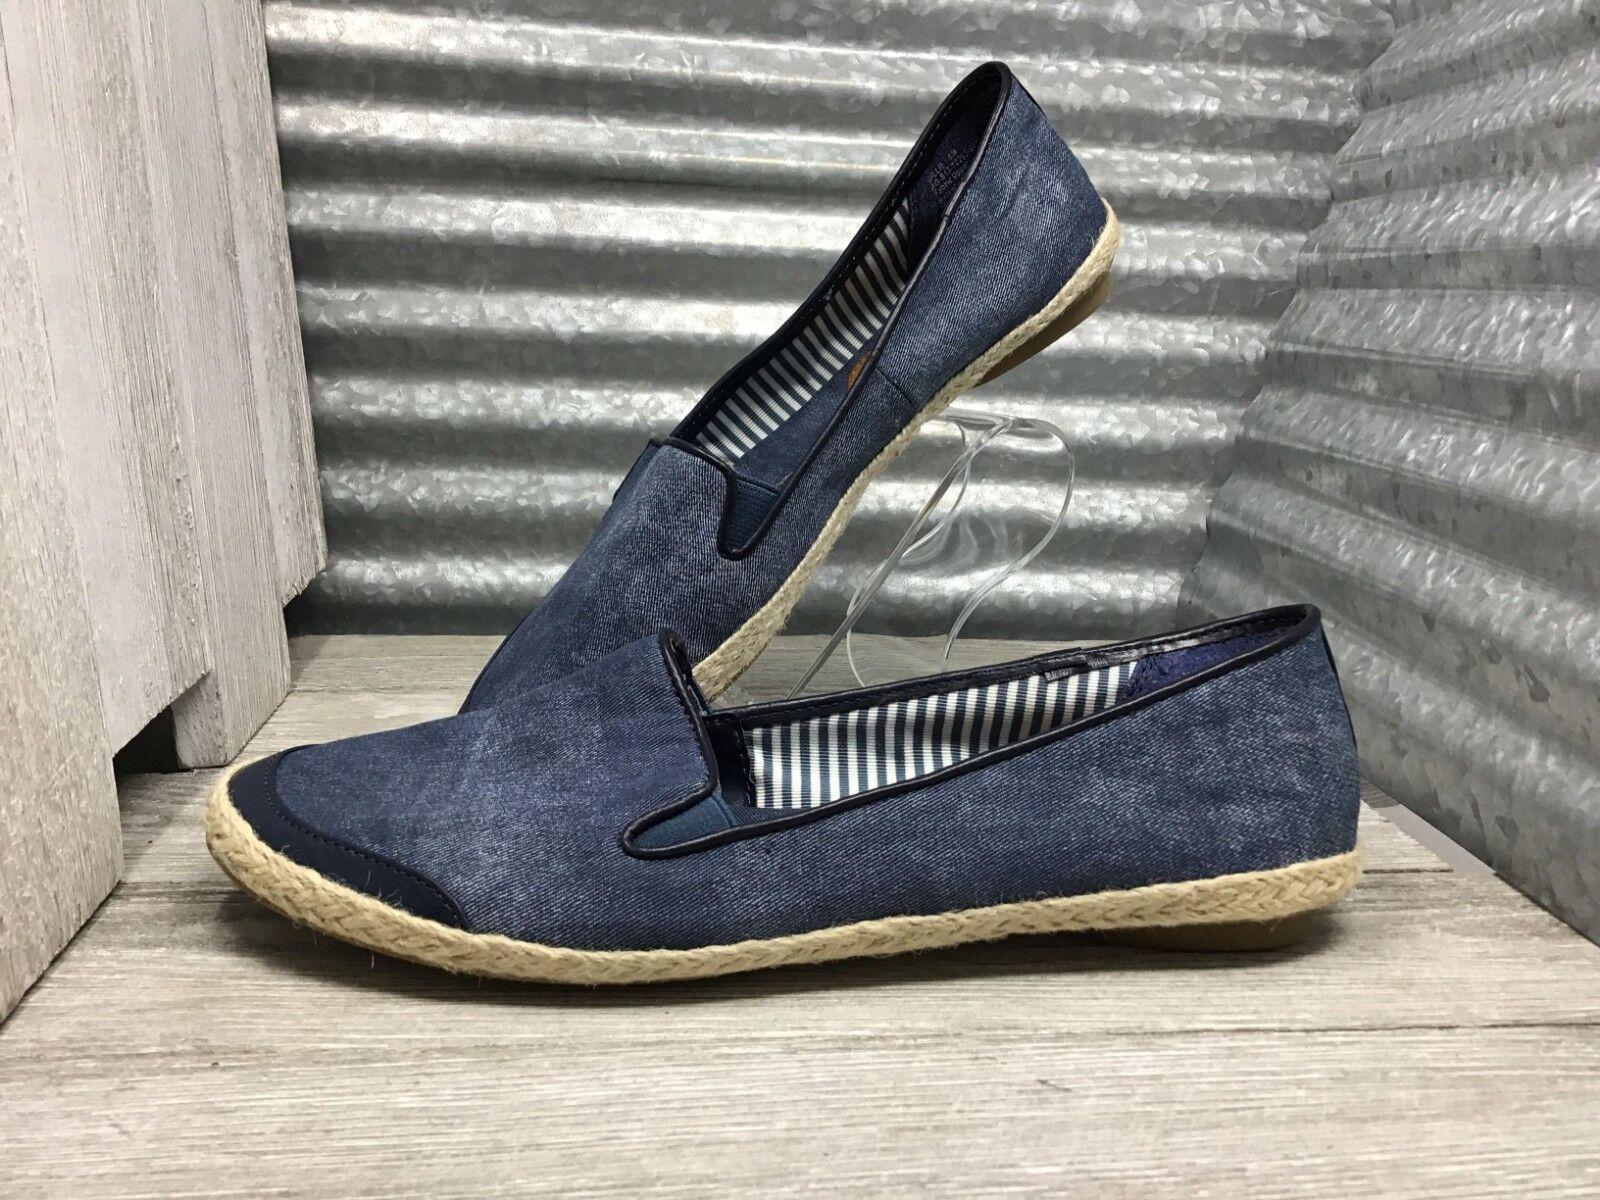 Kim Rodger Denim Loafer Espadrille Trim Comfort Slip On Women's shoes Size 9